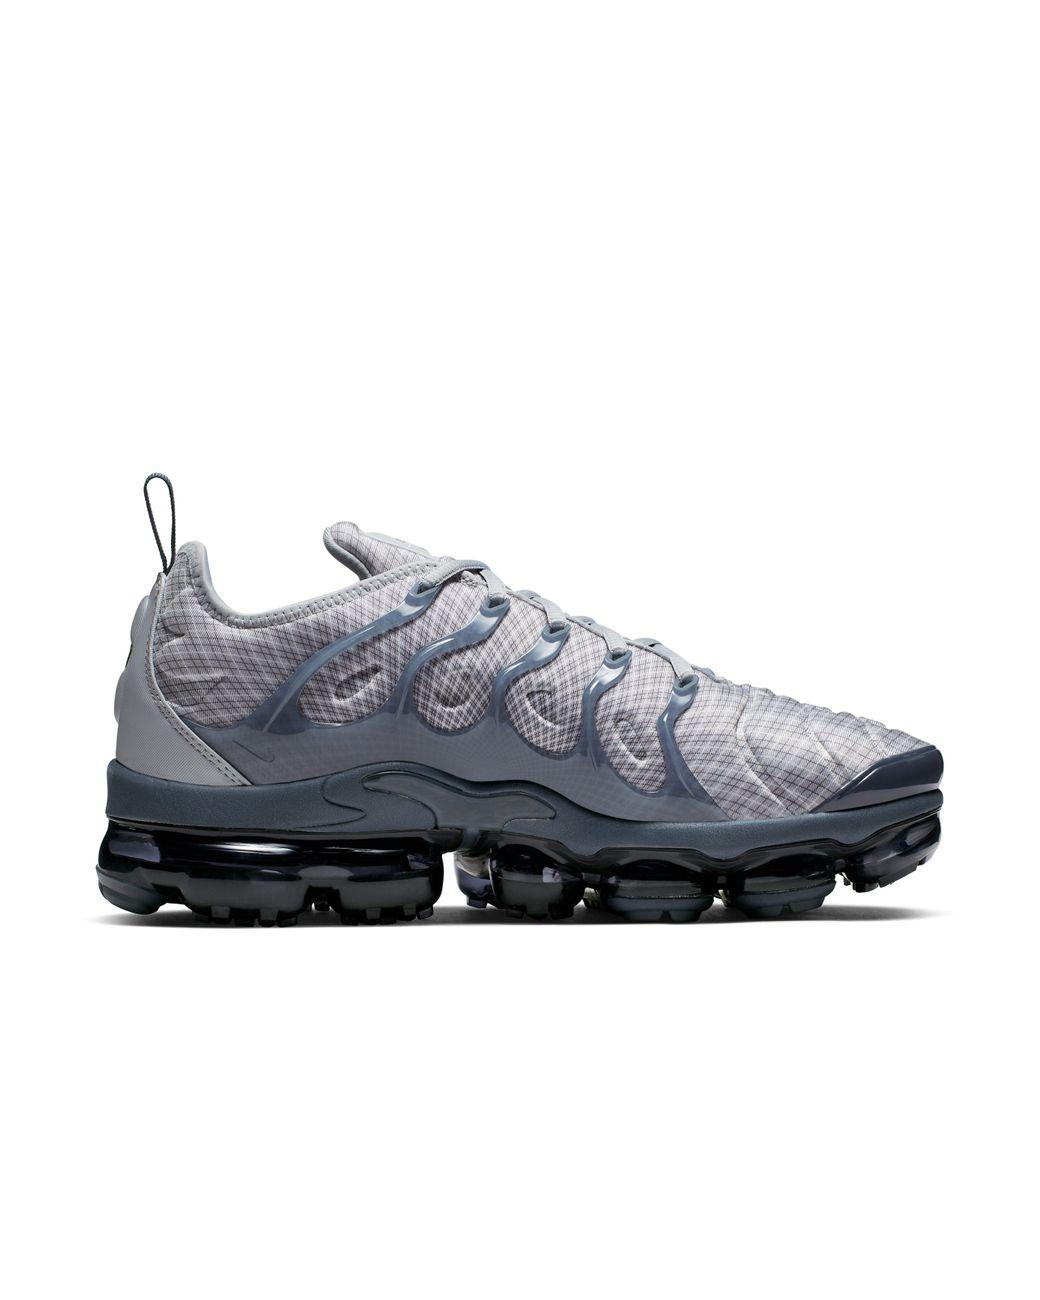 Actuación tofu haz  Nike Air Vapormax Plus in Grey (Gray) for Men - Save 1% - Lyst